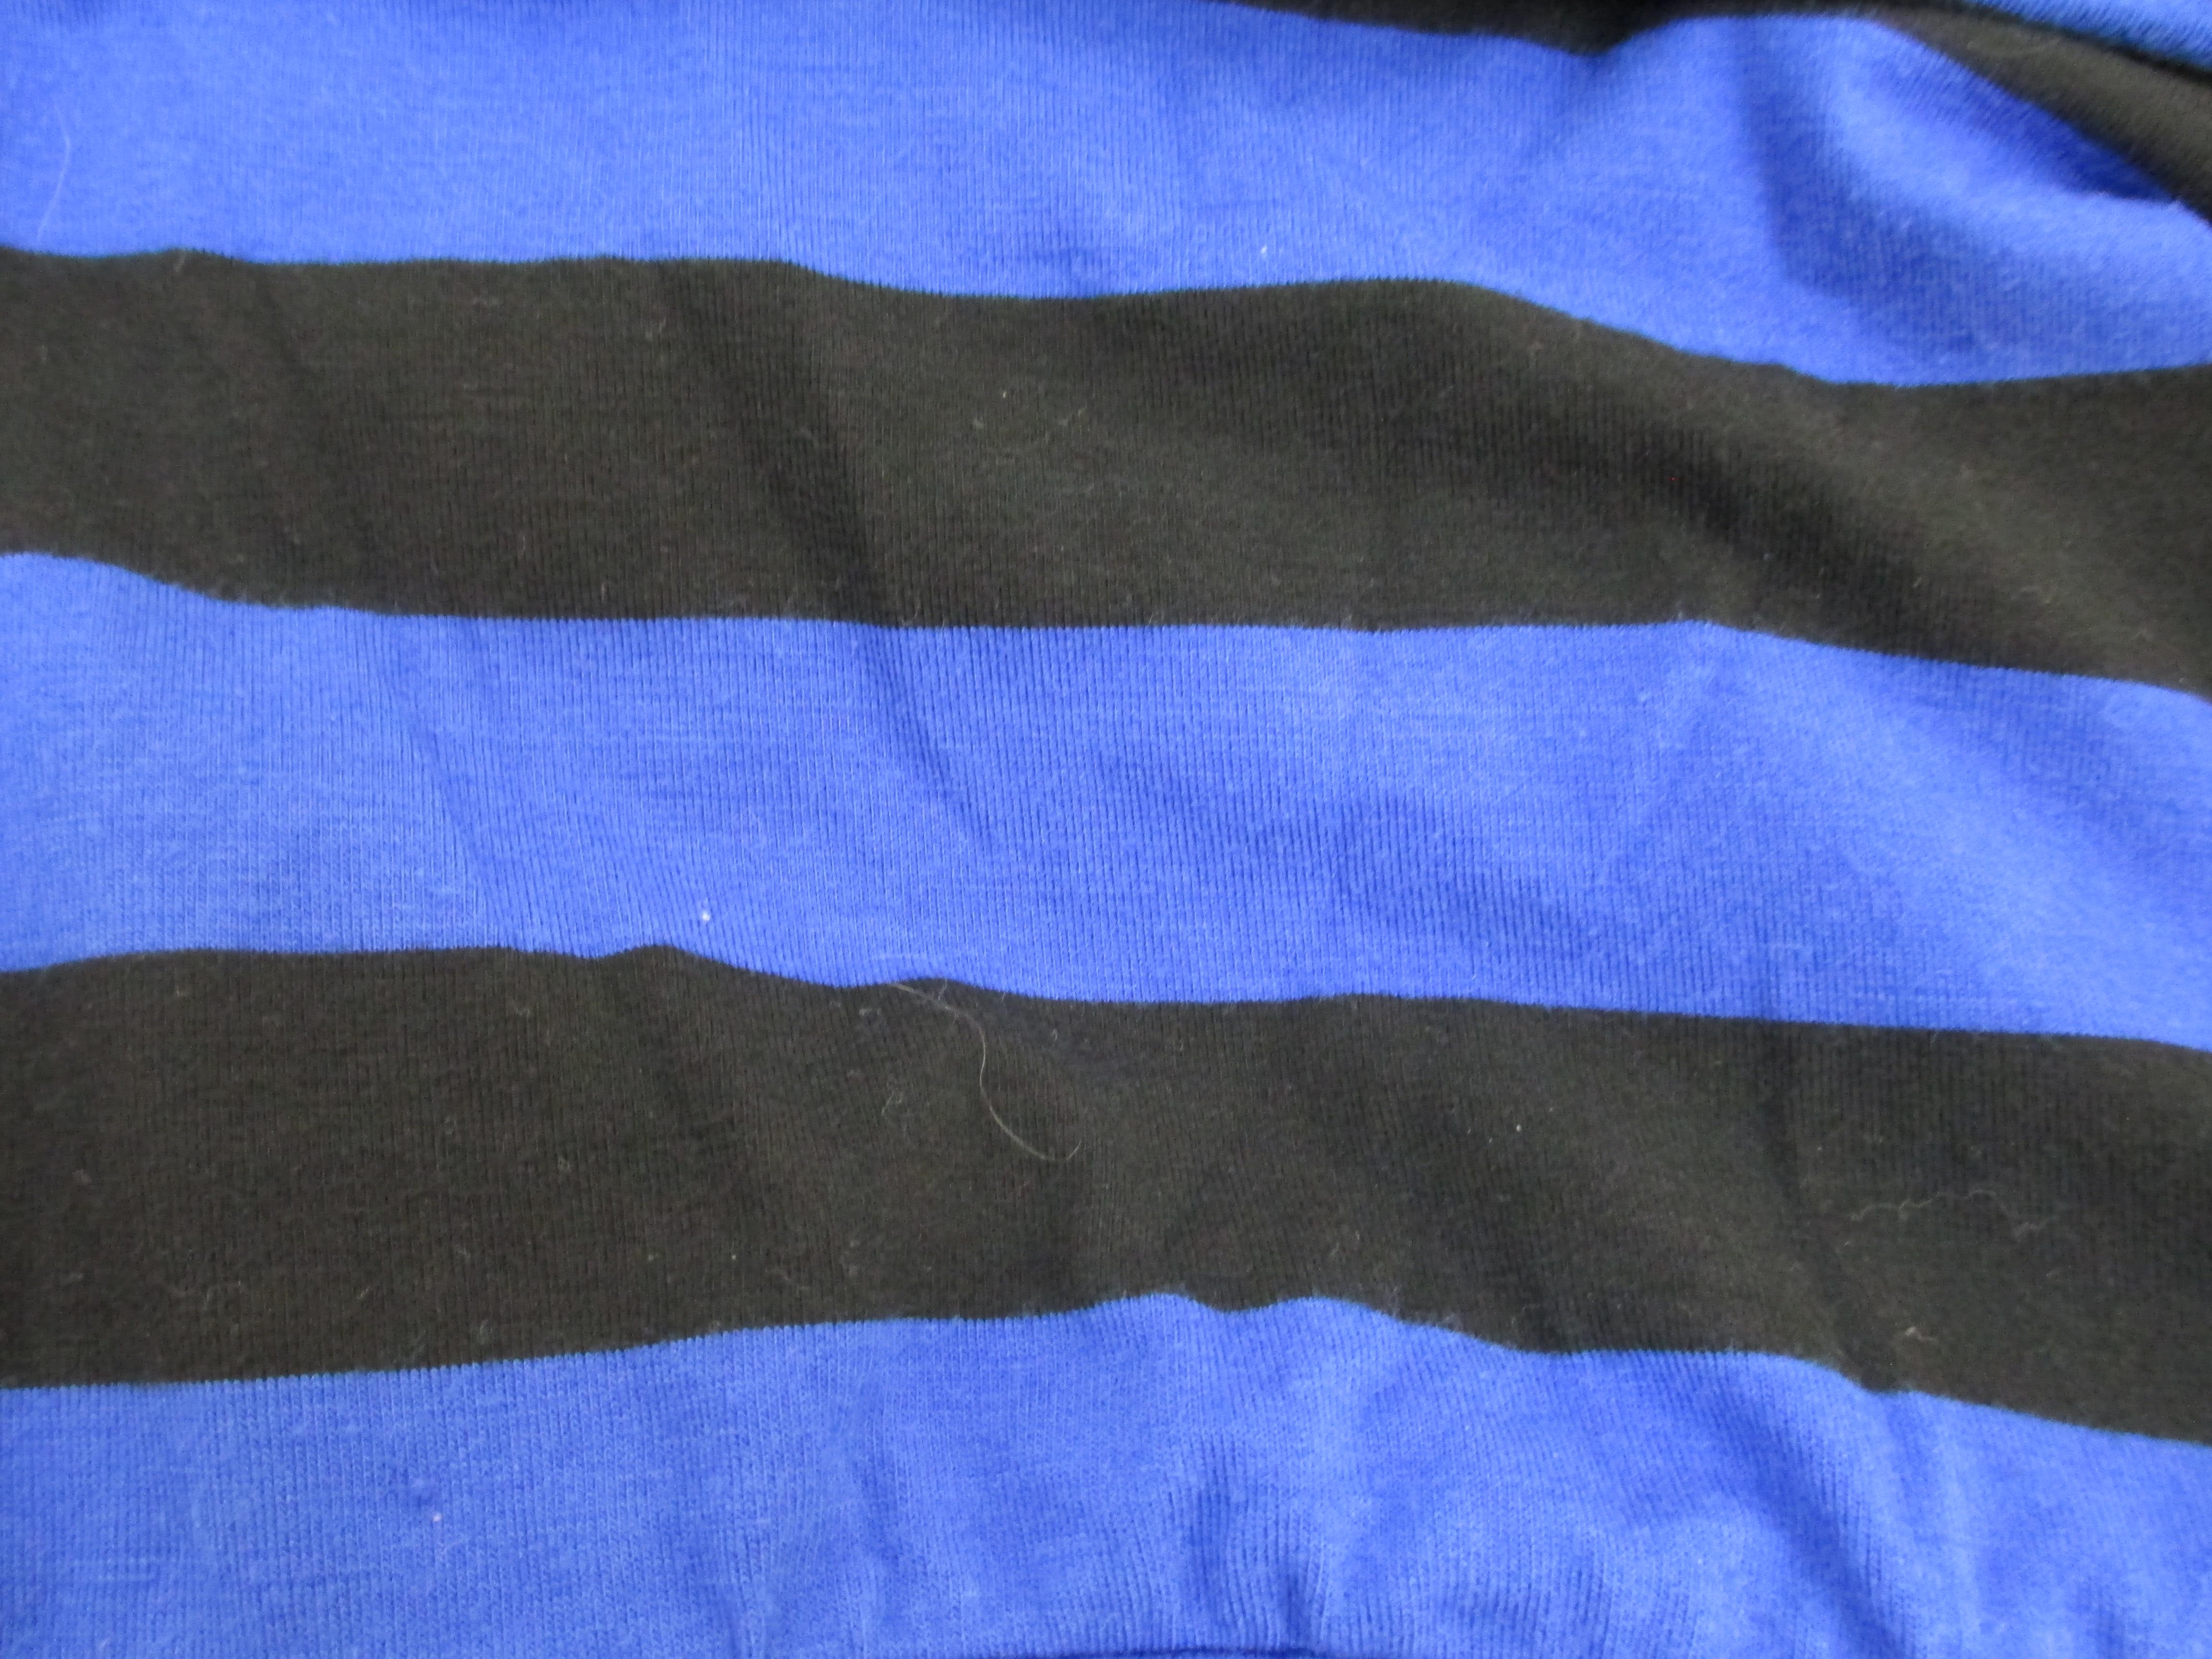 Dress by Xhilaration Black & Blue Striped Women's Size XS